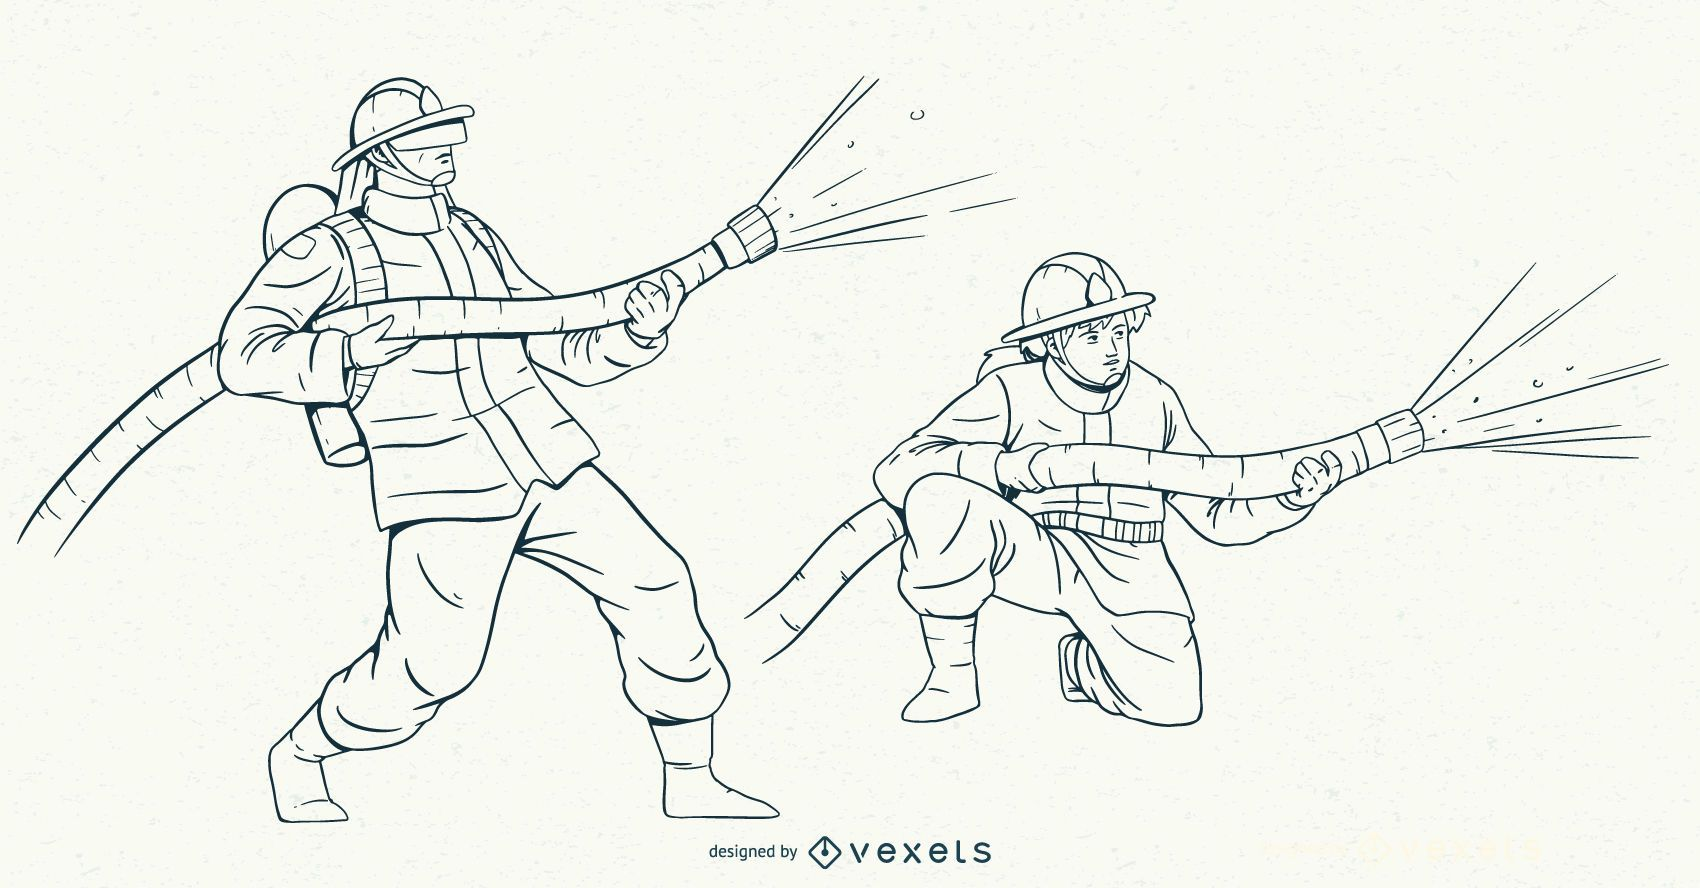 Conjunto de caracteres de trazo de bomberos